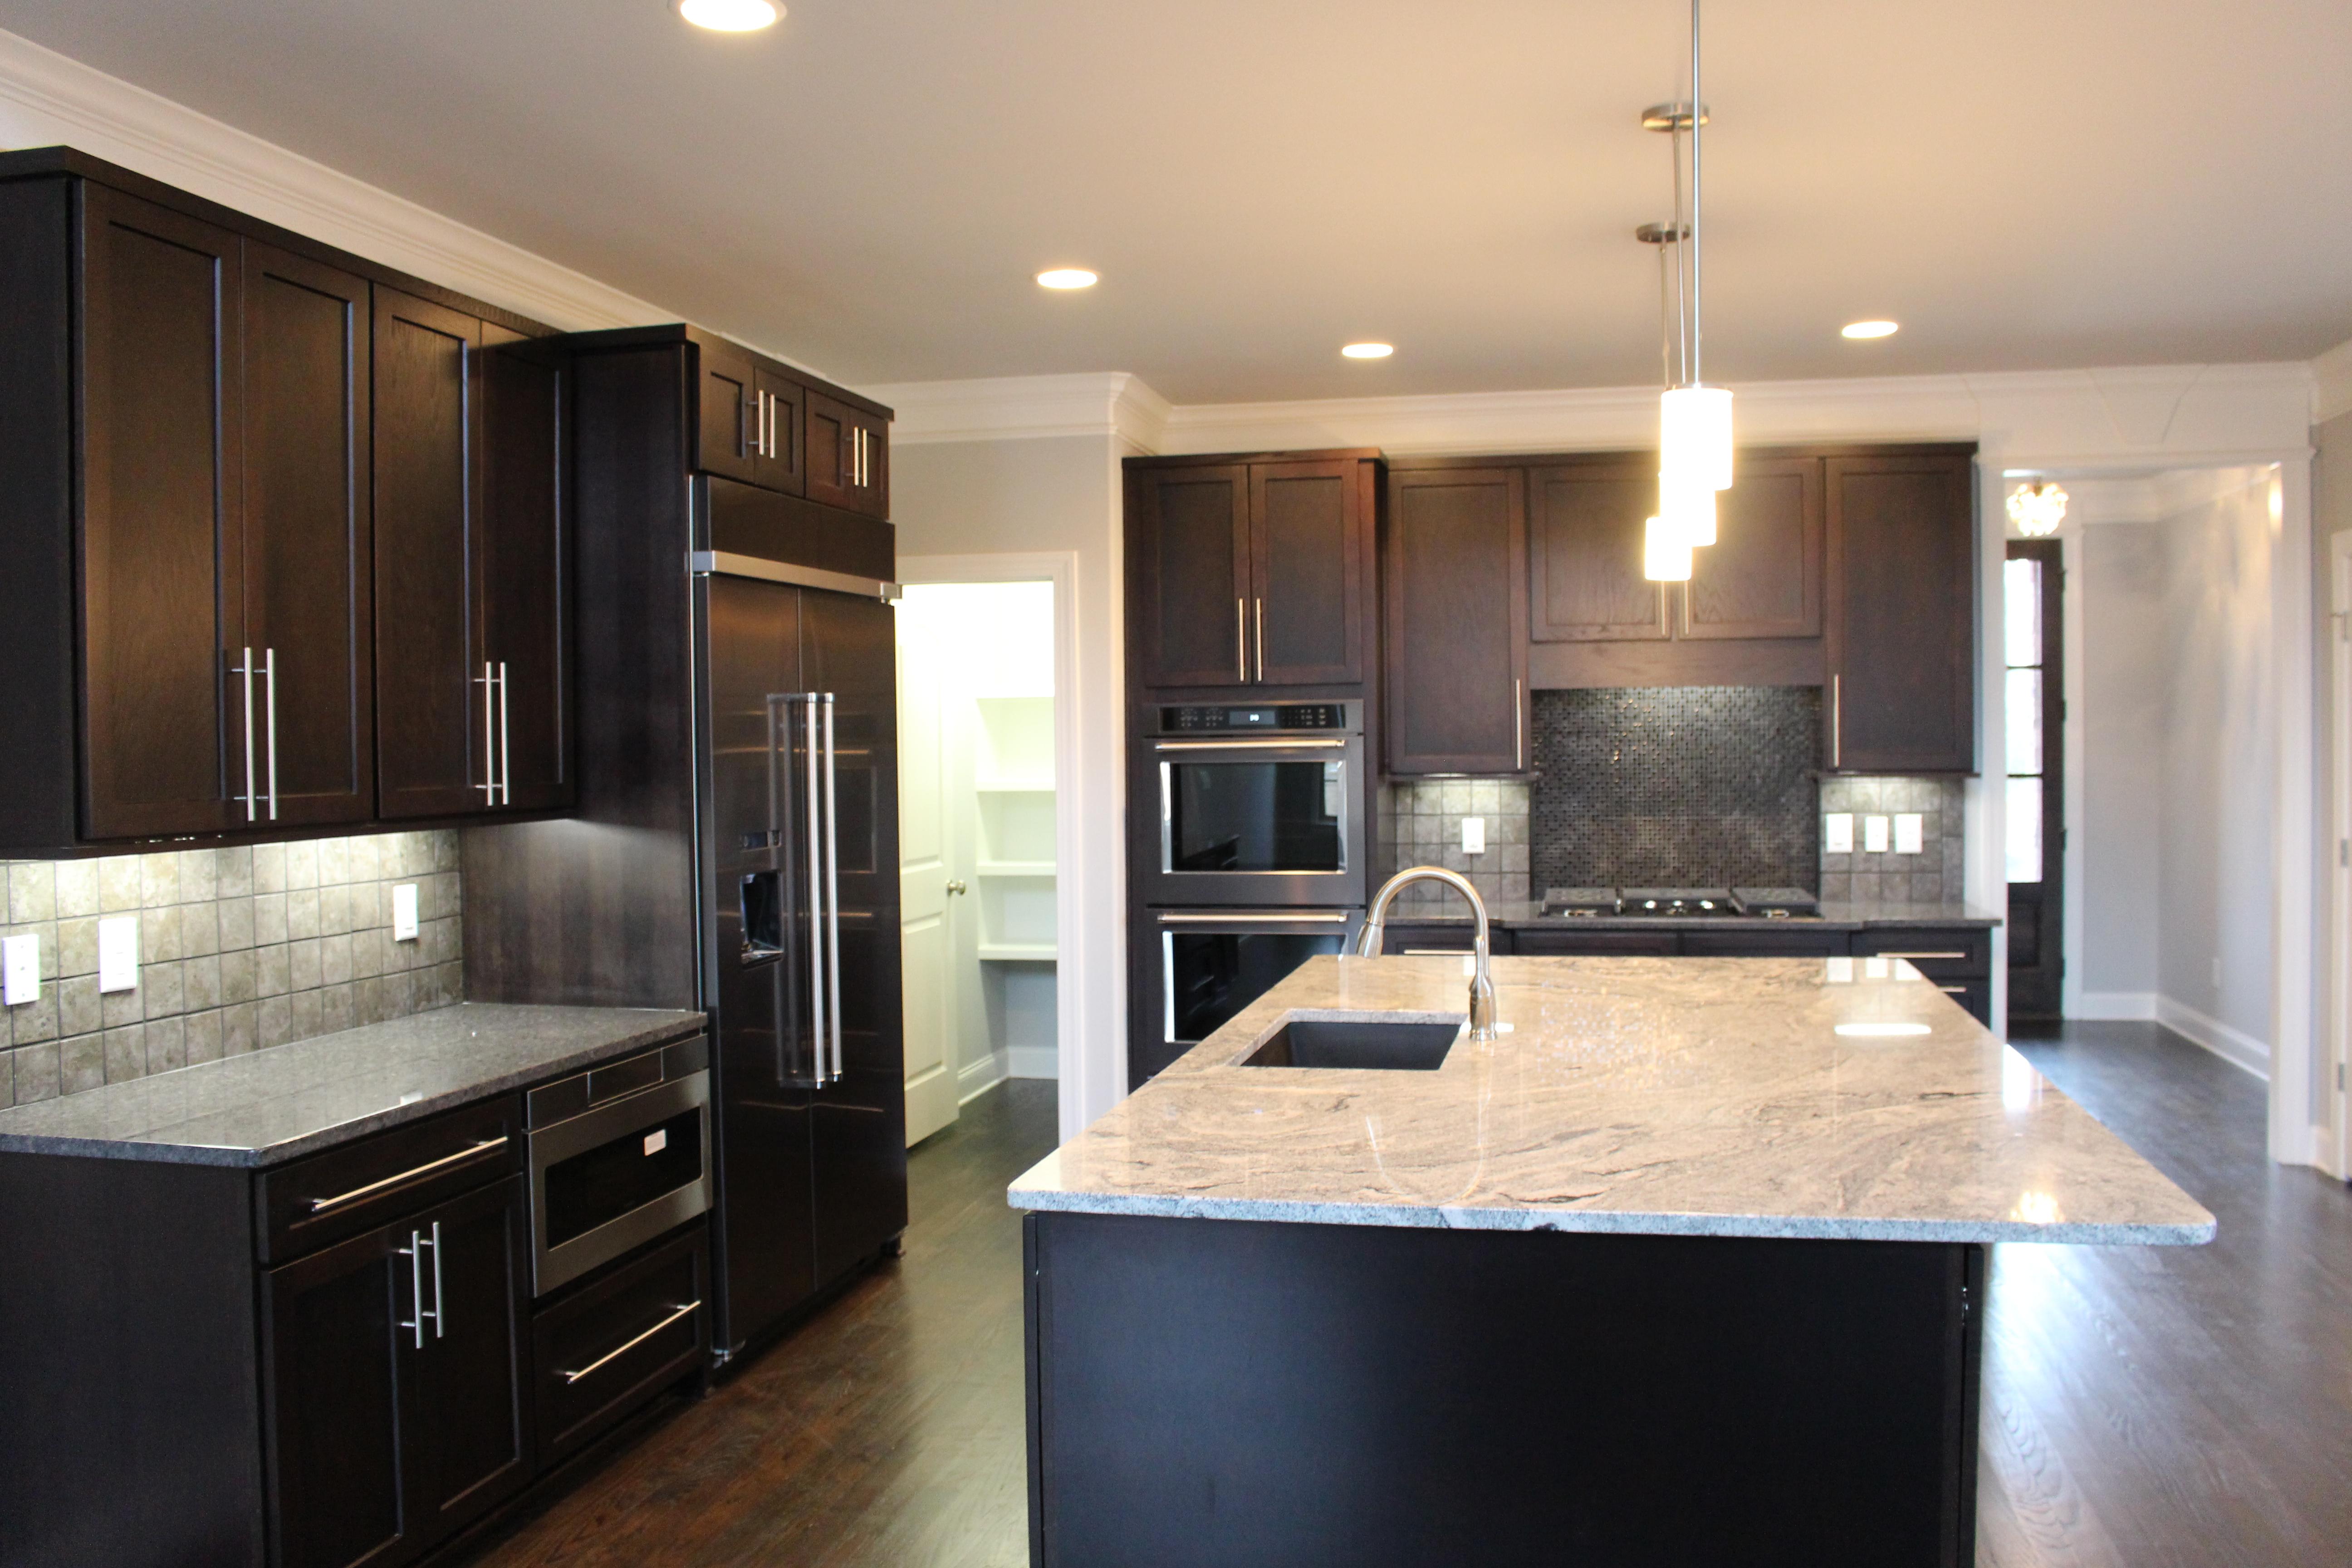 Lot 202 AB kitchen2